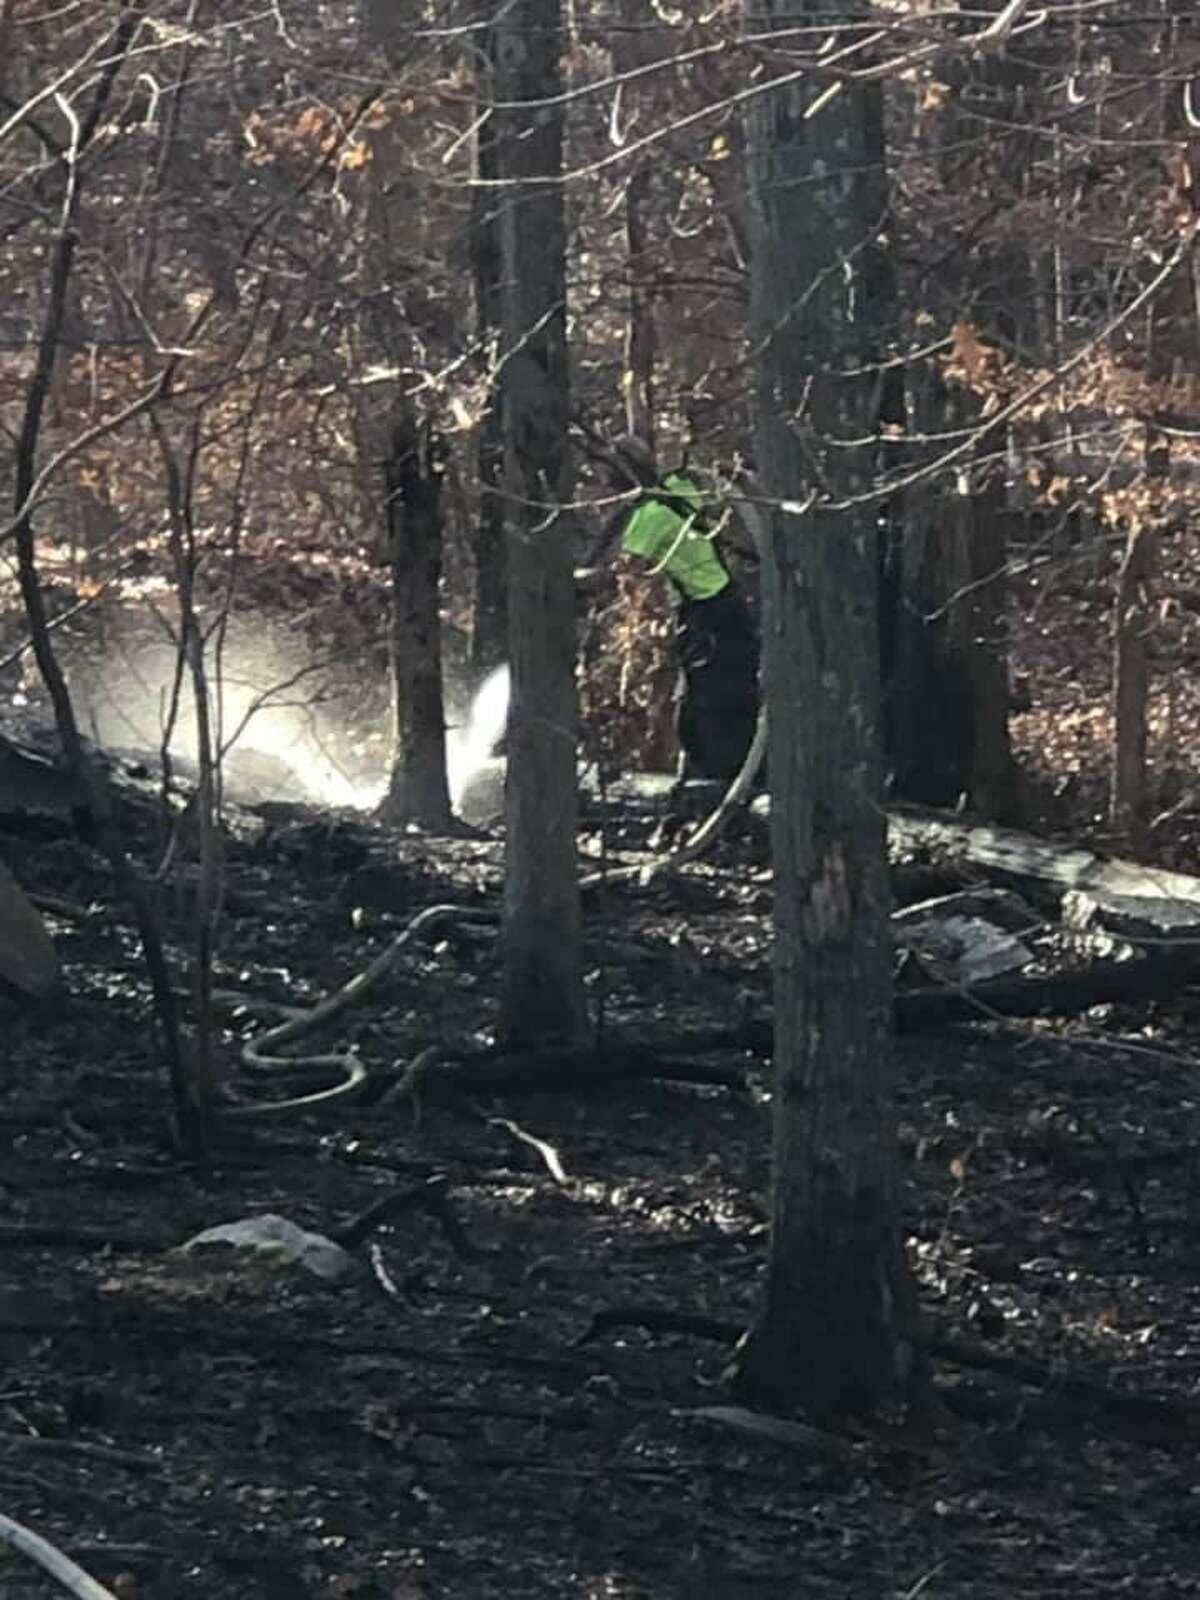 Fire crews on scene for a brush fire in Monroe, Conn., on Monday, Nov. 9, 2020.